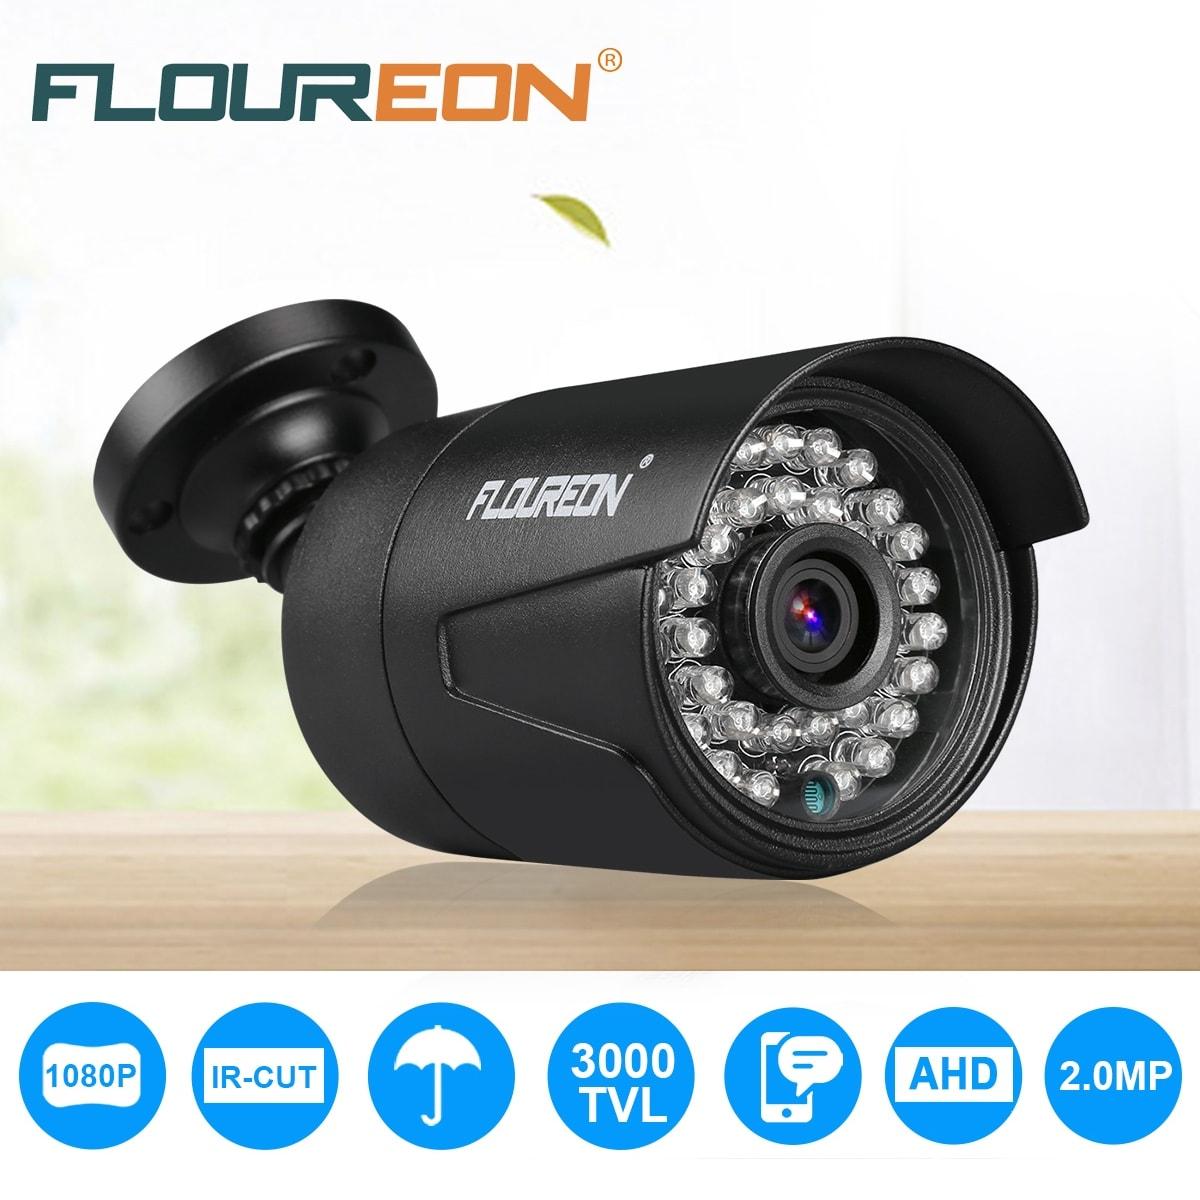 1080P AHD Color Outdoor CCTV Surveillance Security Camera 36-LED IR Night Vision